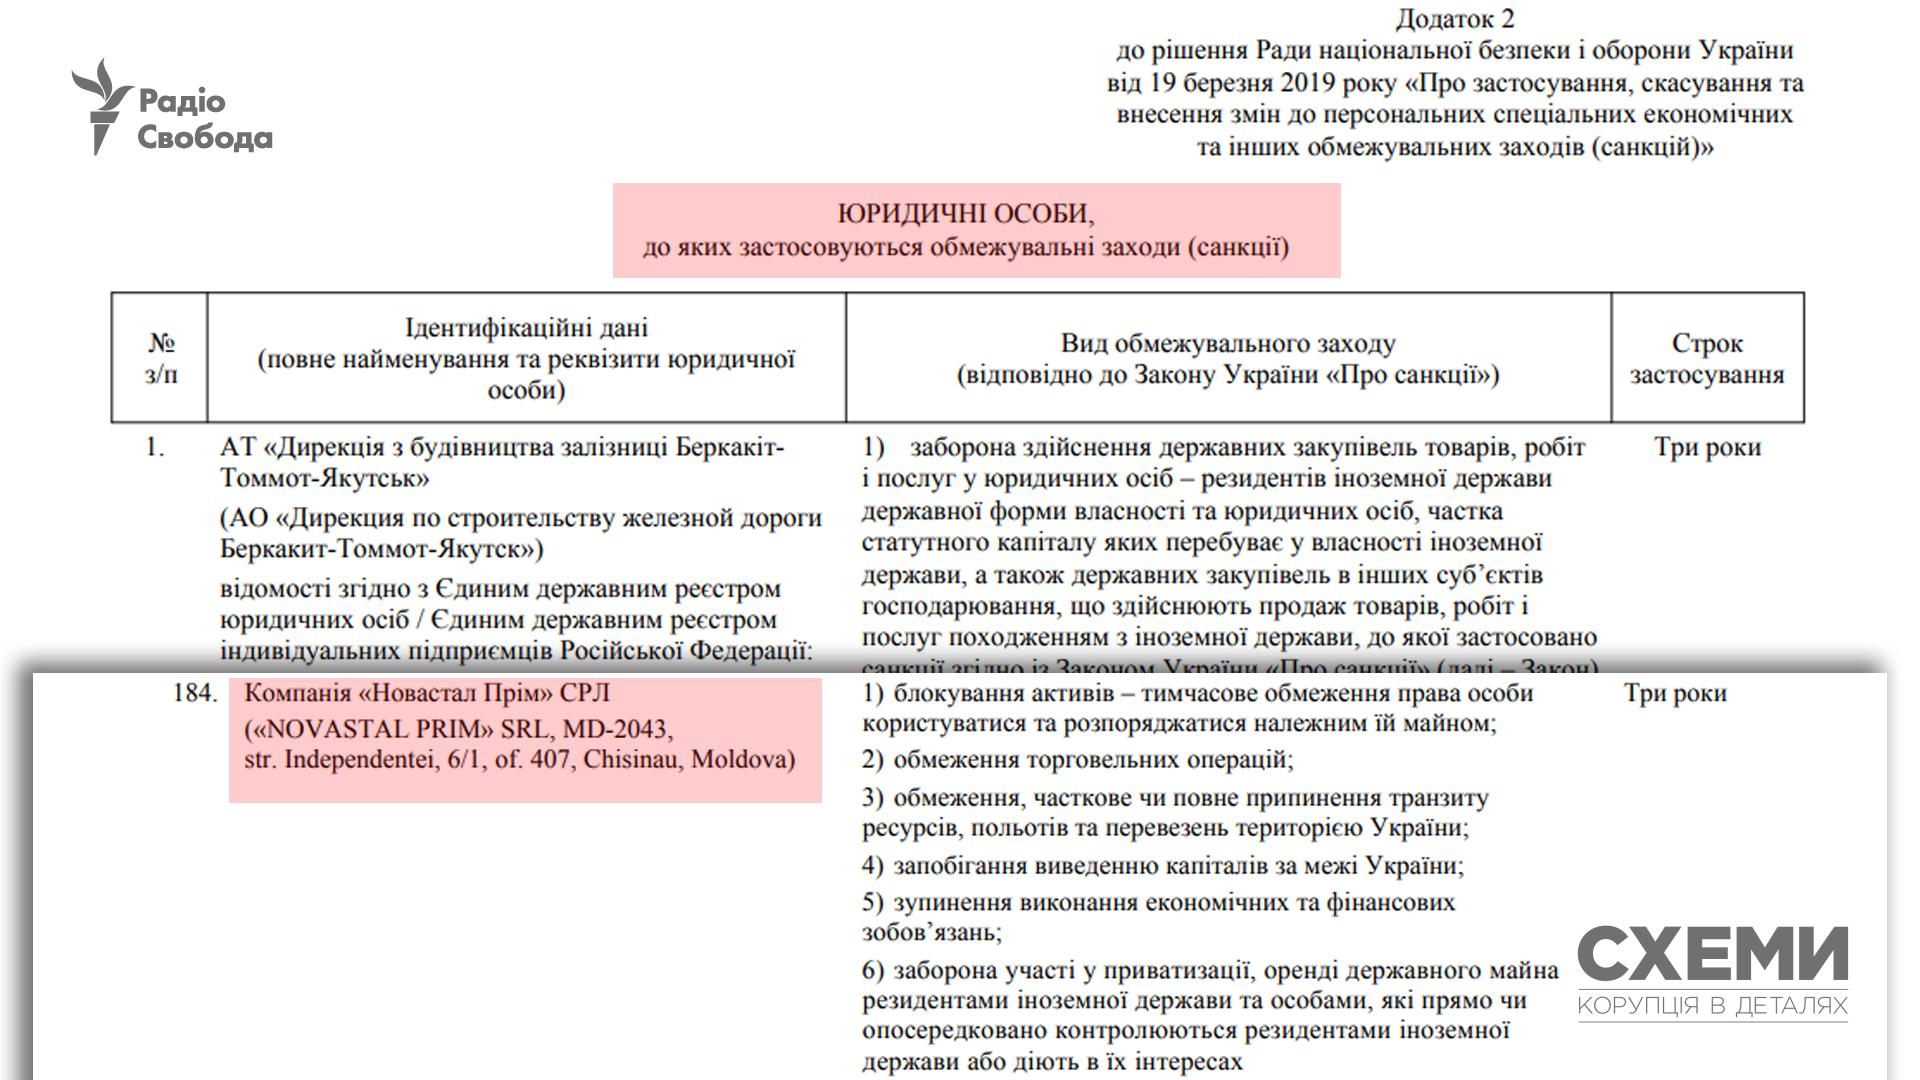 novastal-sanktii-19